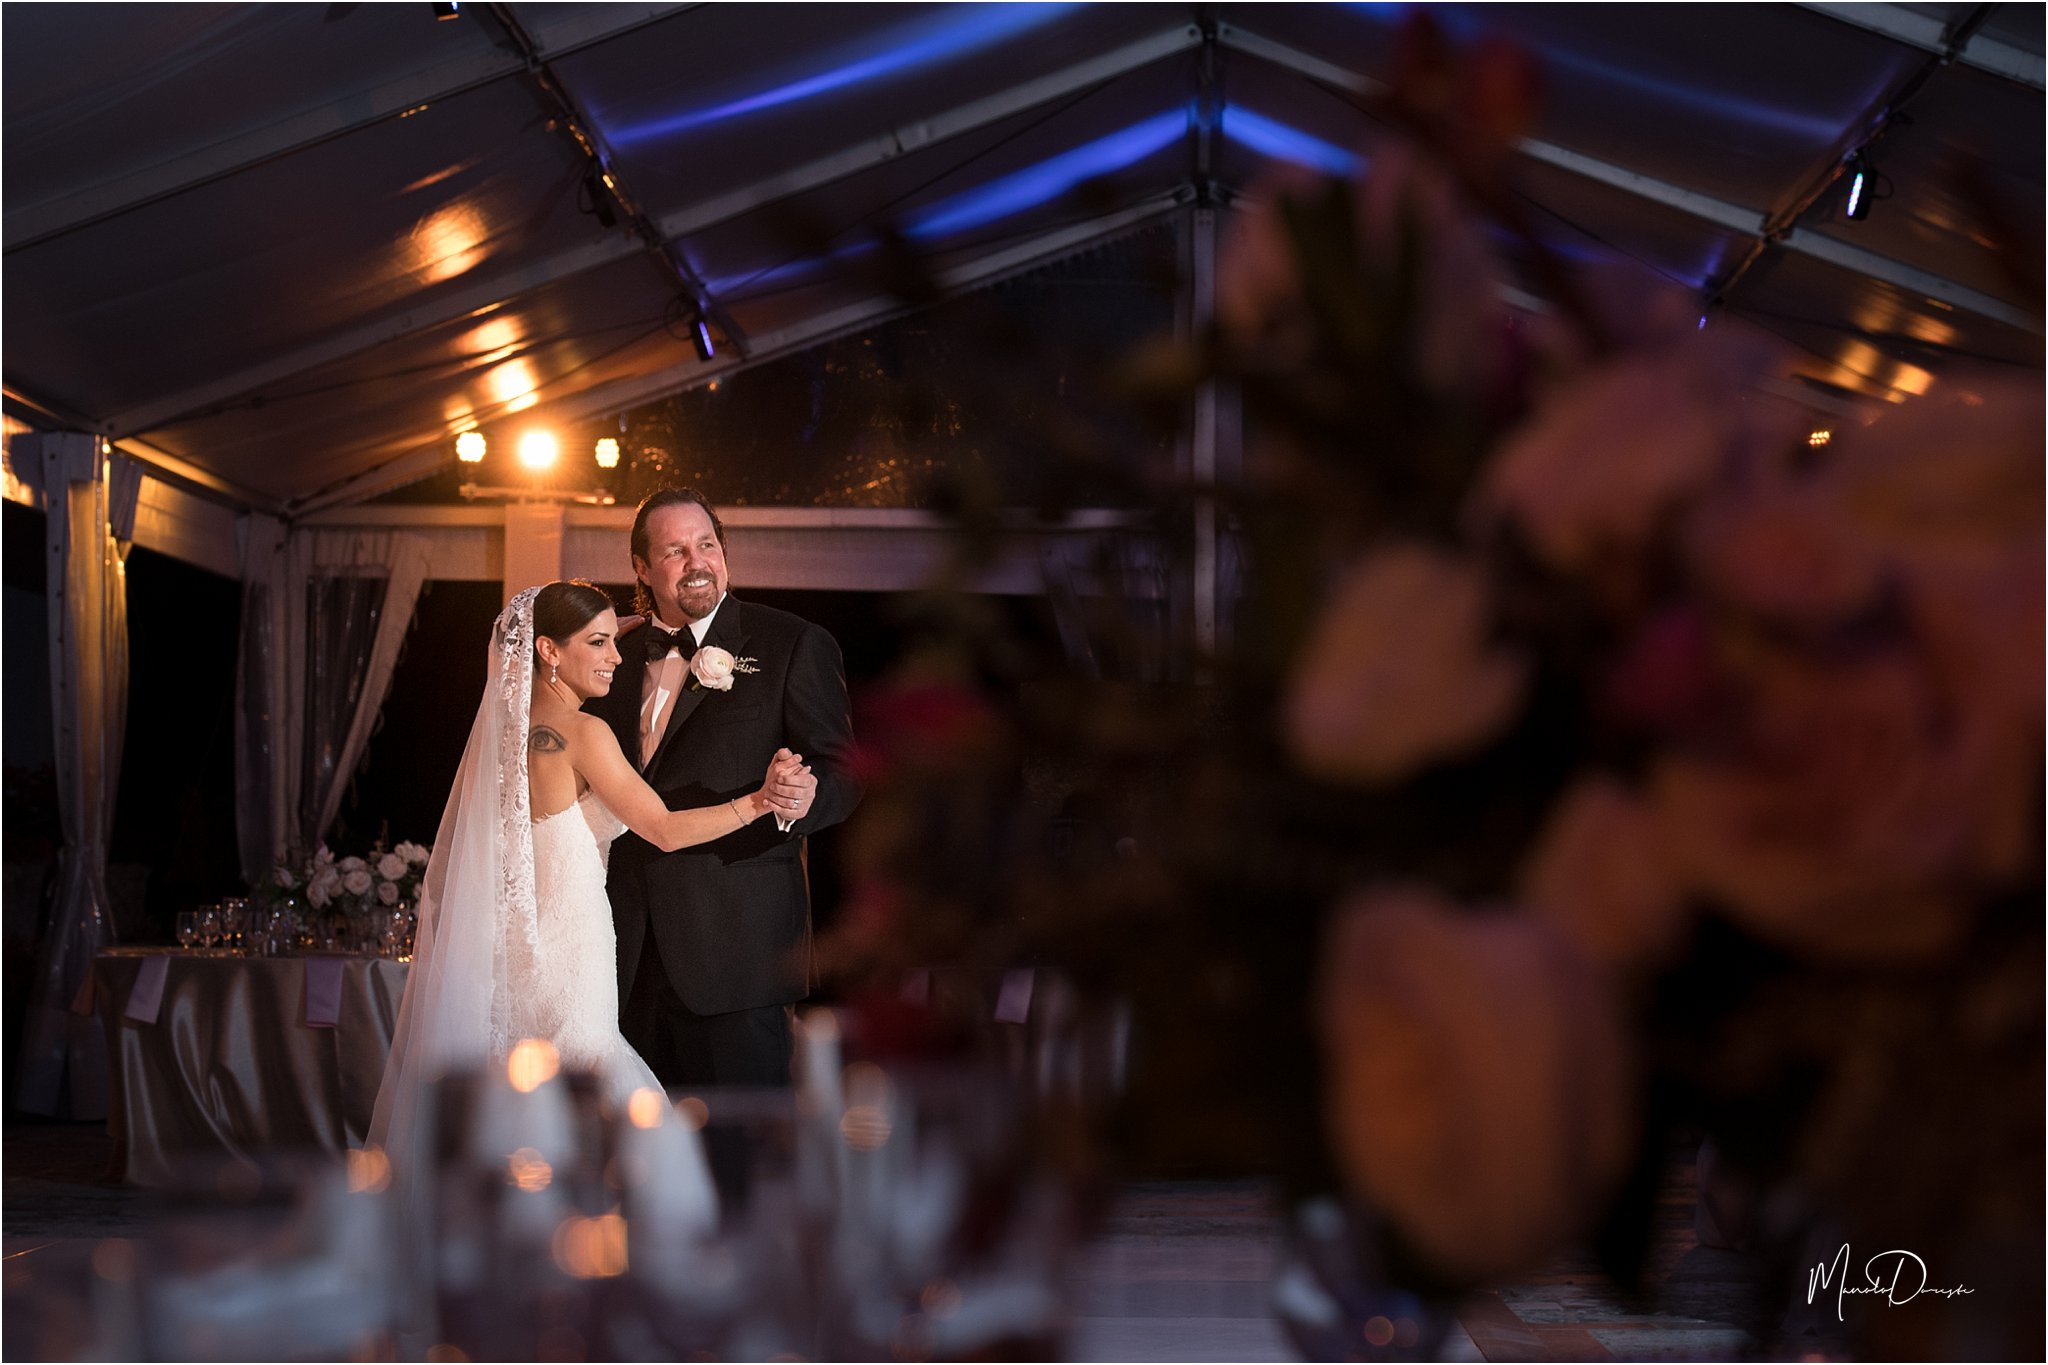 00760_ManoloDoreste_InFocusStudios_Wedding_Family_Photography_Miami_MiamiPhotographer.jpg